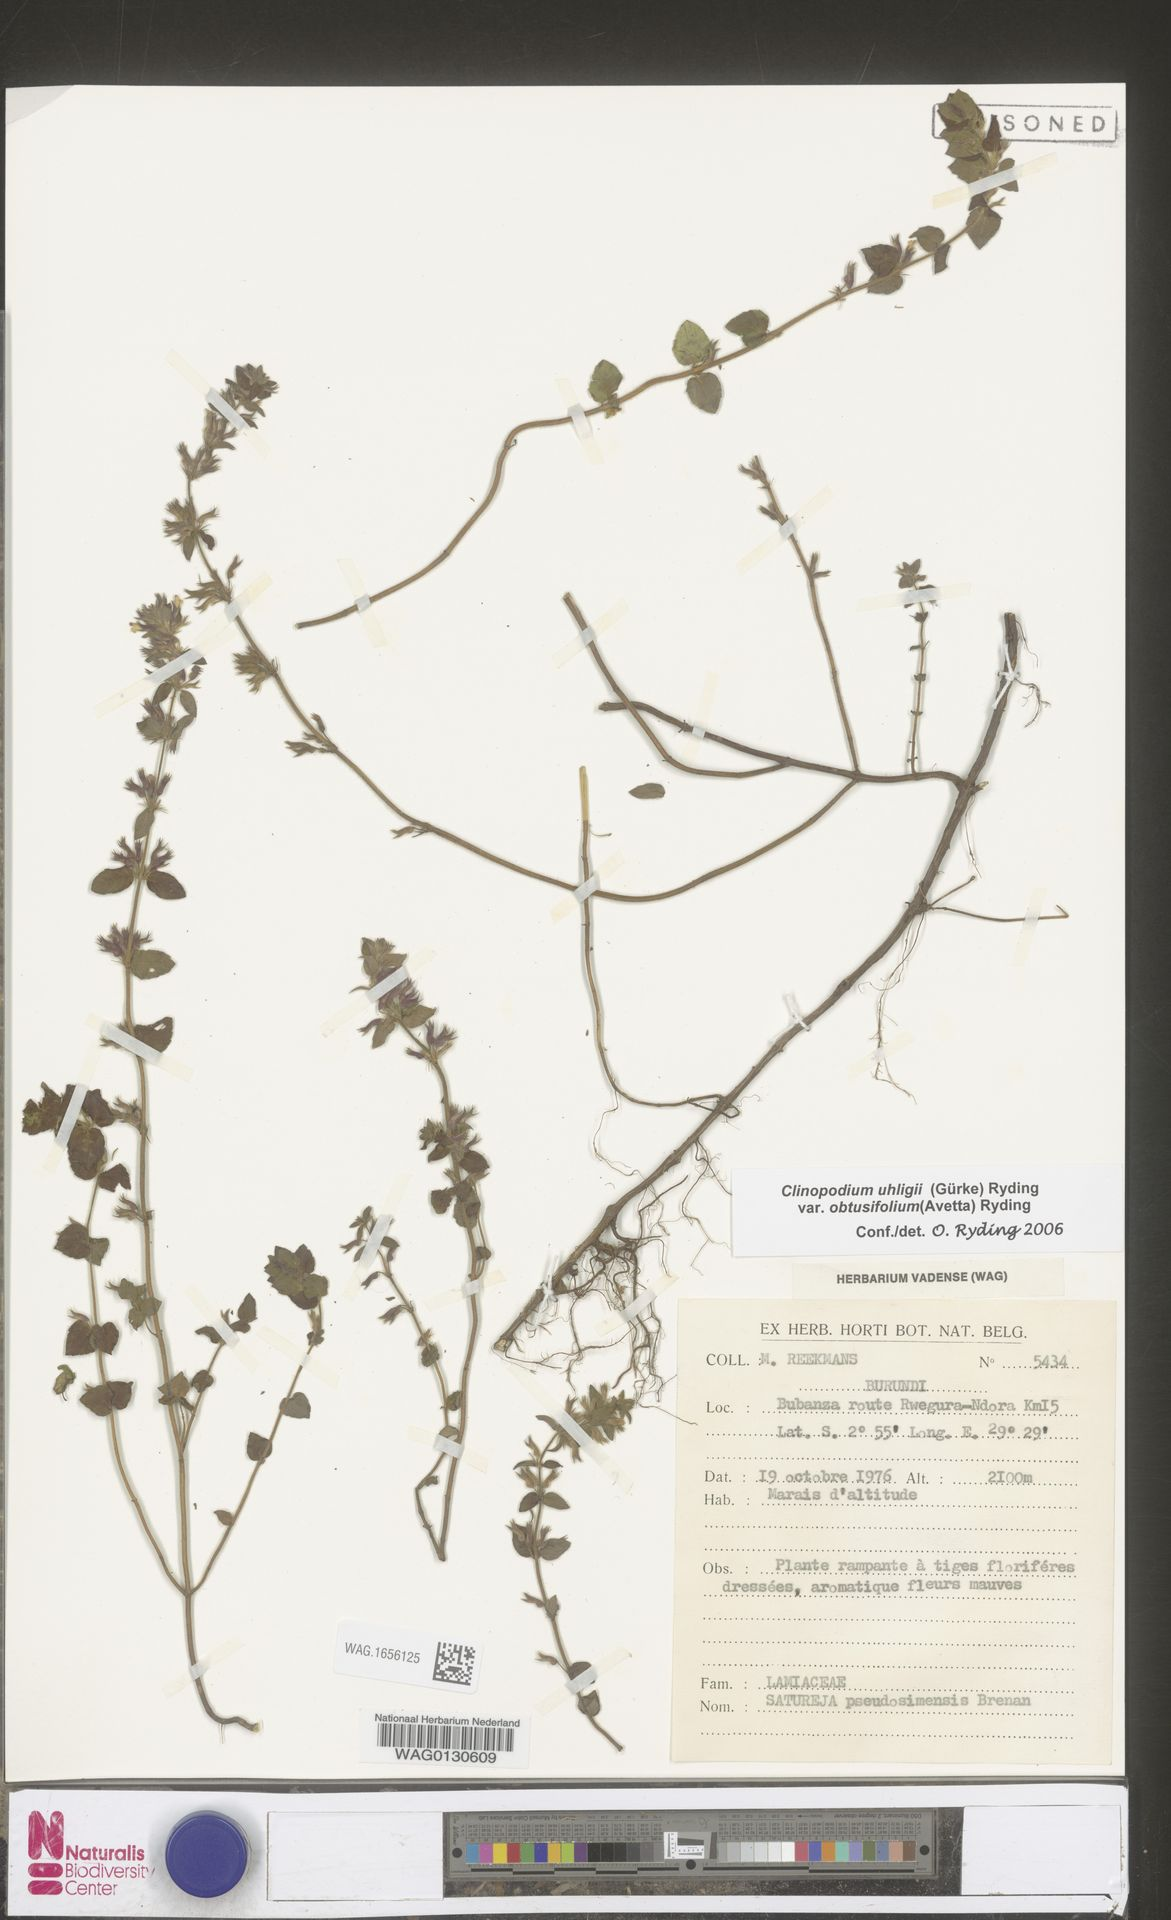 WAG.1656125 | Clinopodium uhligii var. obtusifolium (Avetta) Ryding